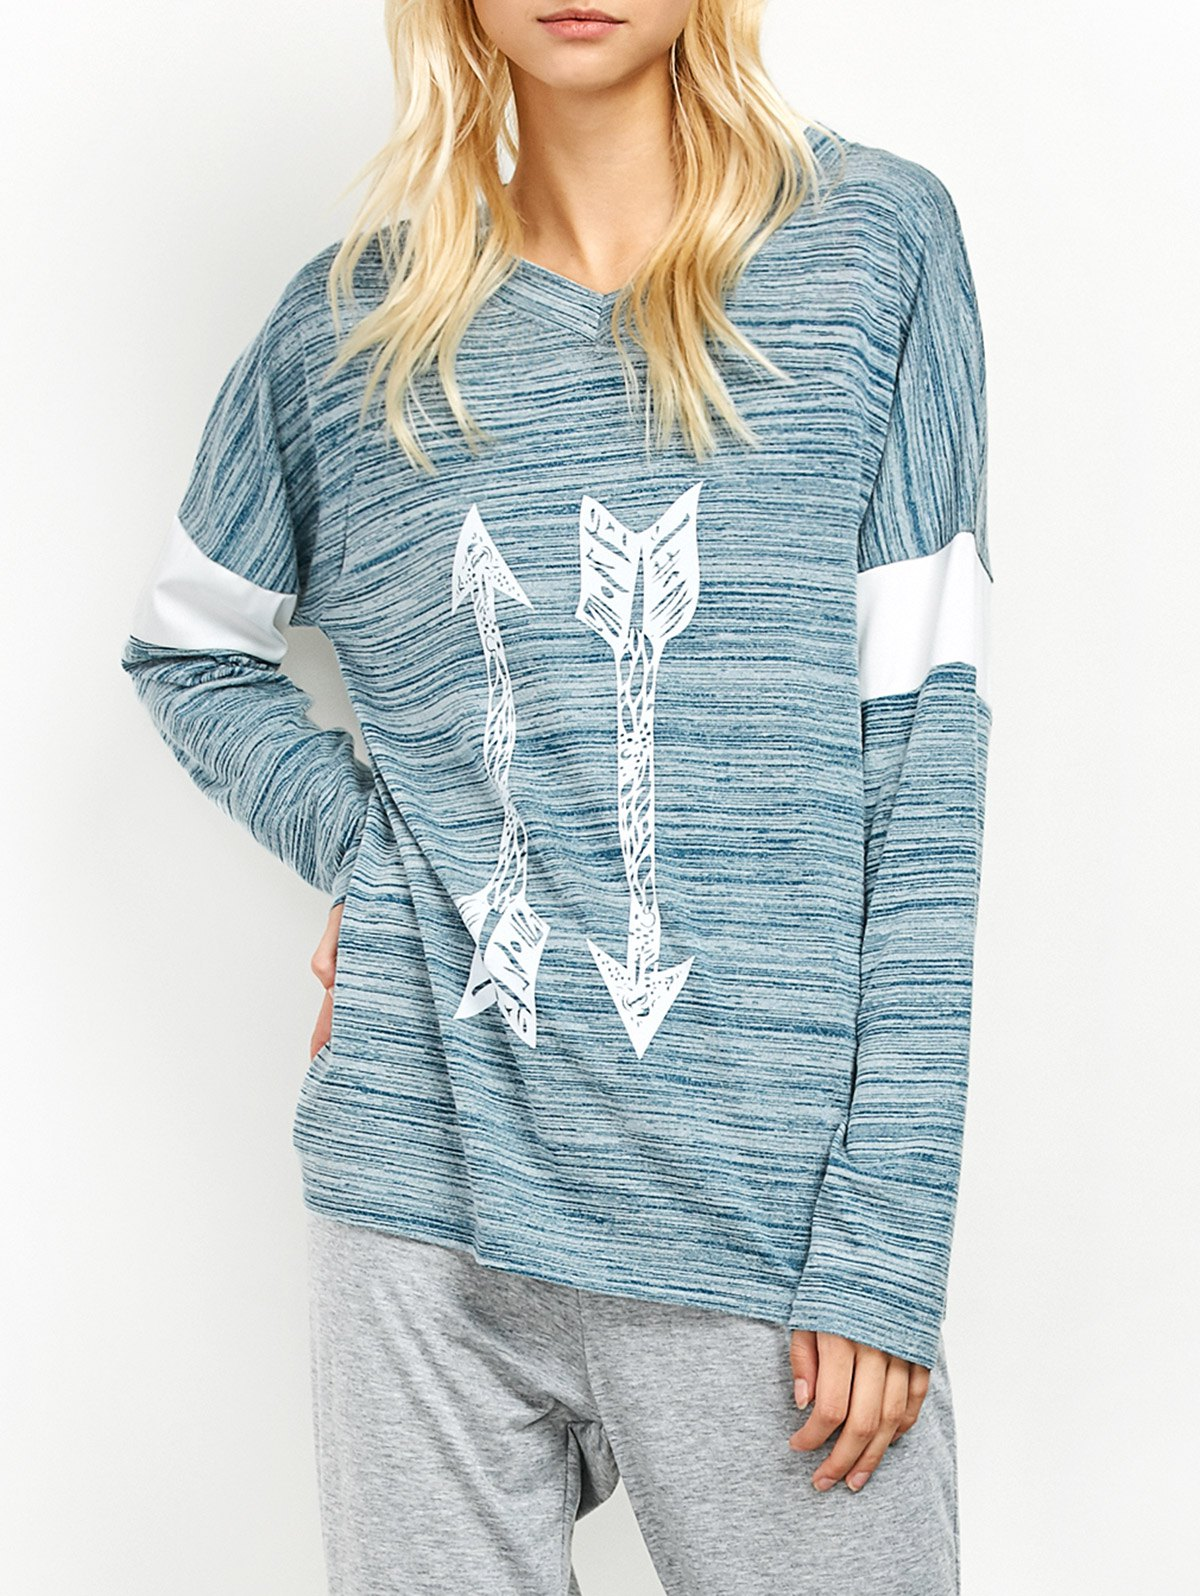 Space Dyed Arrow Pattern V Neck T-ShirtClothes<br><br><br>Size: S<br>Color: LIGHT BLUE